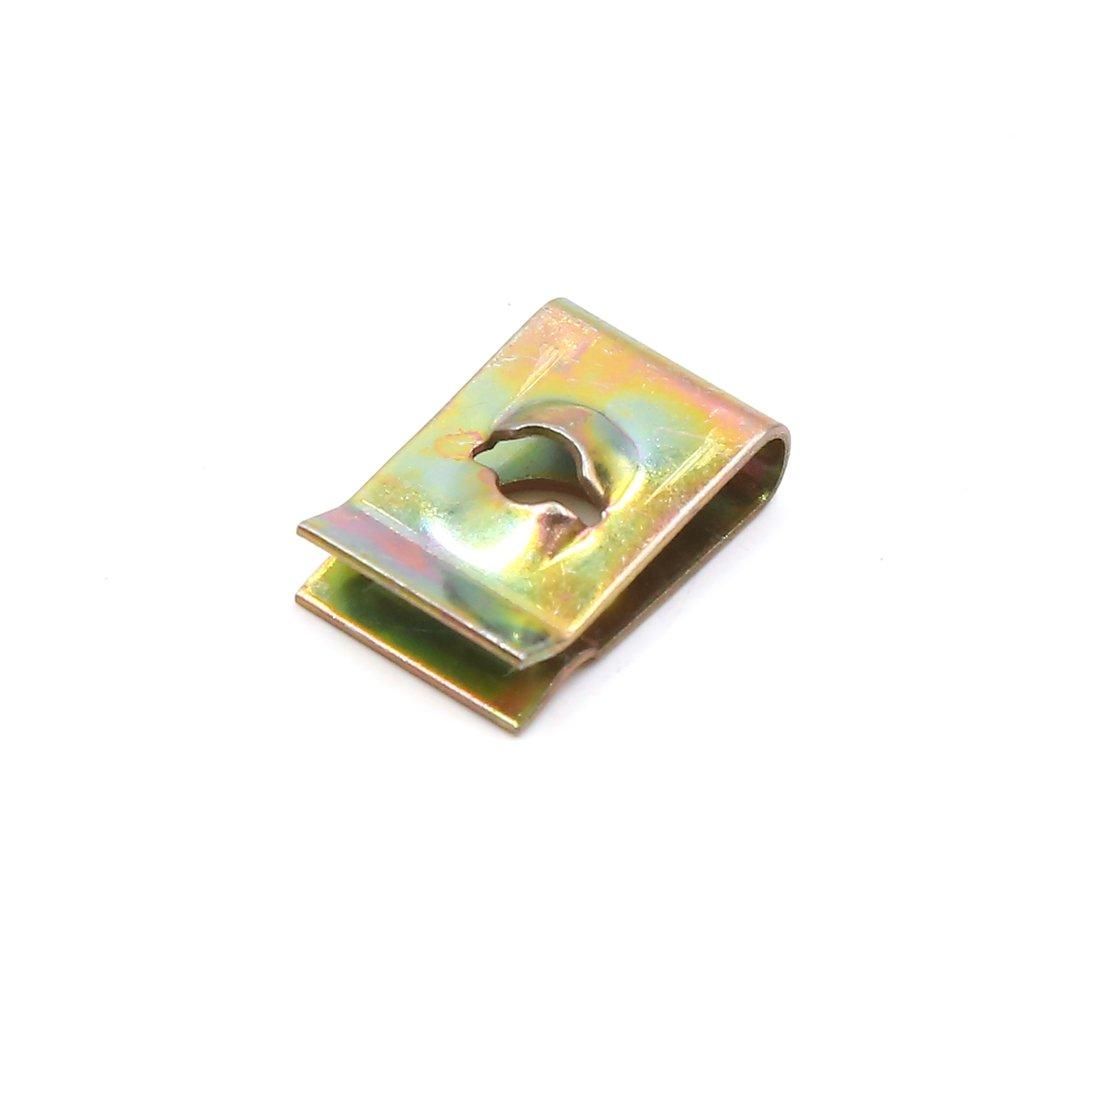 sourcingmap/® 20stk 3mm Loch Feder Blechmutter Sicherungsschraube U-Typ Clips Nieten 17x11x5mm de